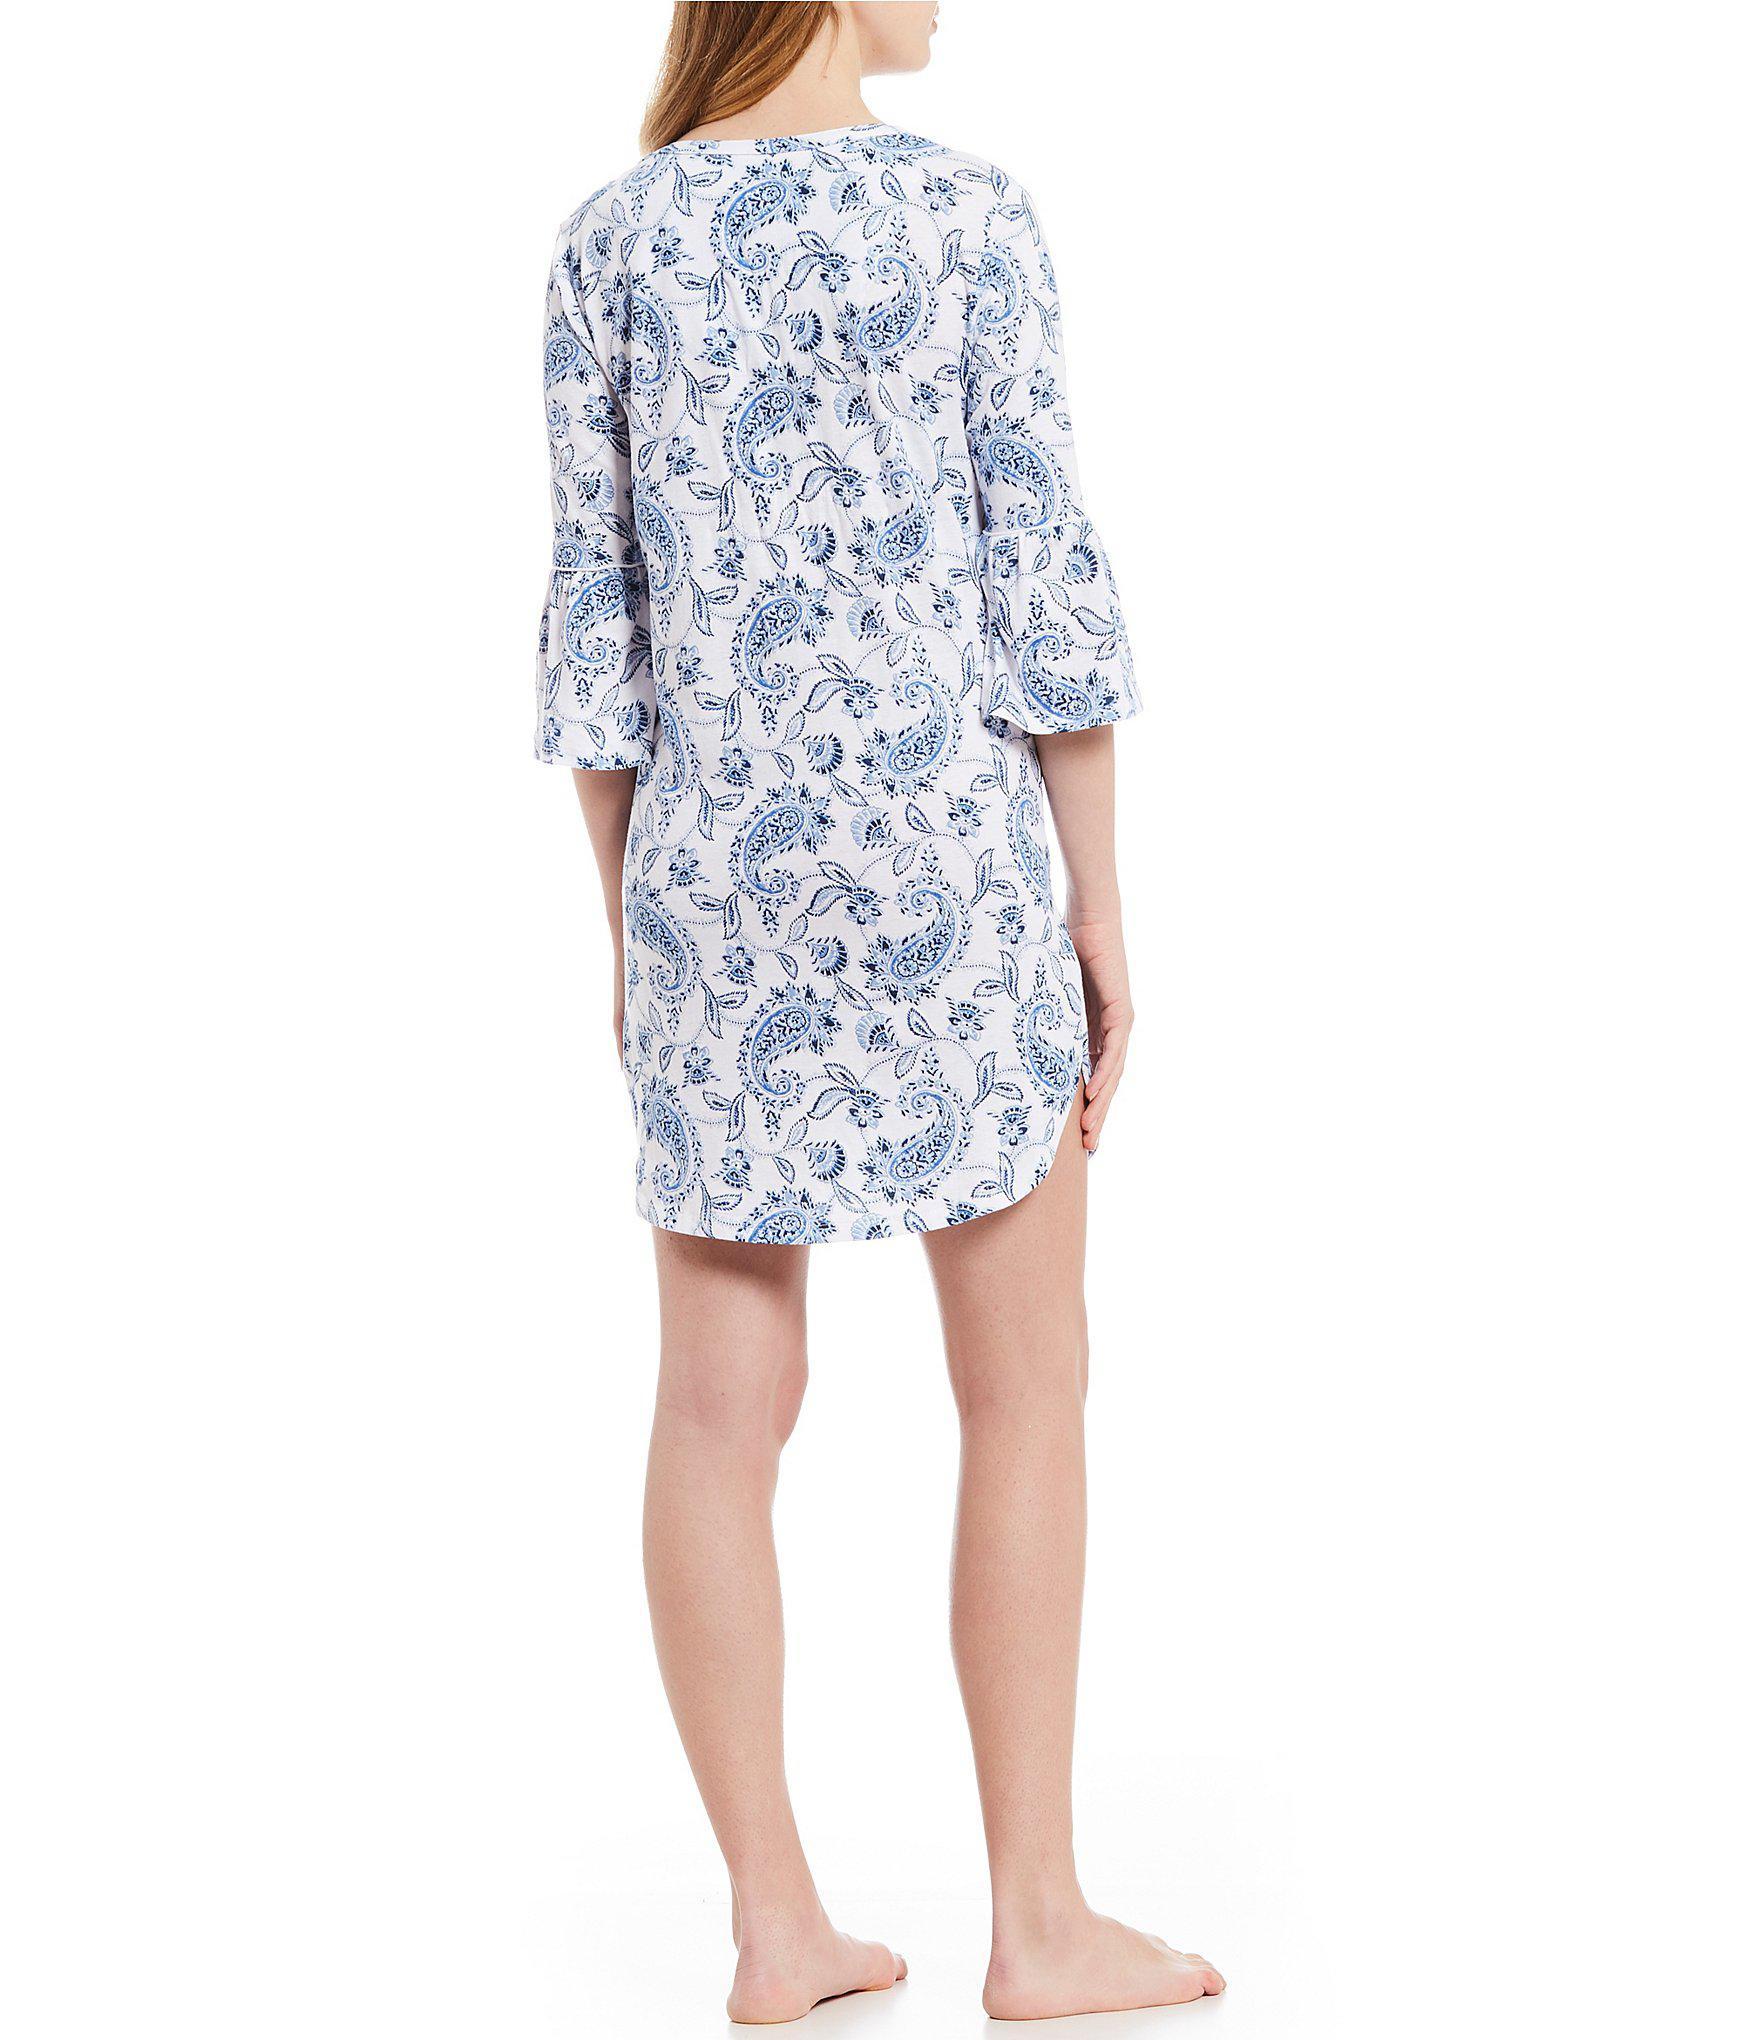 2e32d99884 Lyst - Lauren By Ralph Lauren Petite Paisley-print Jersey Knit ...